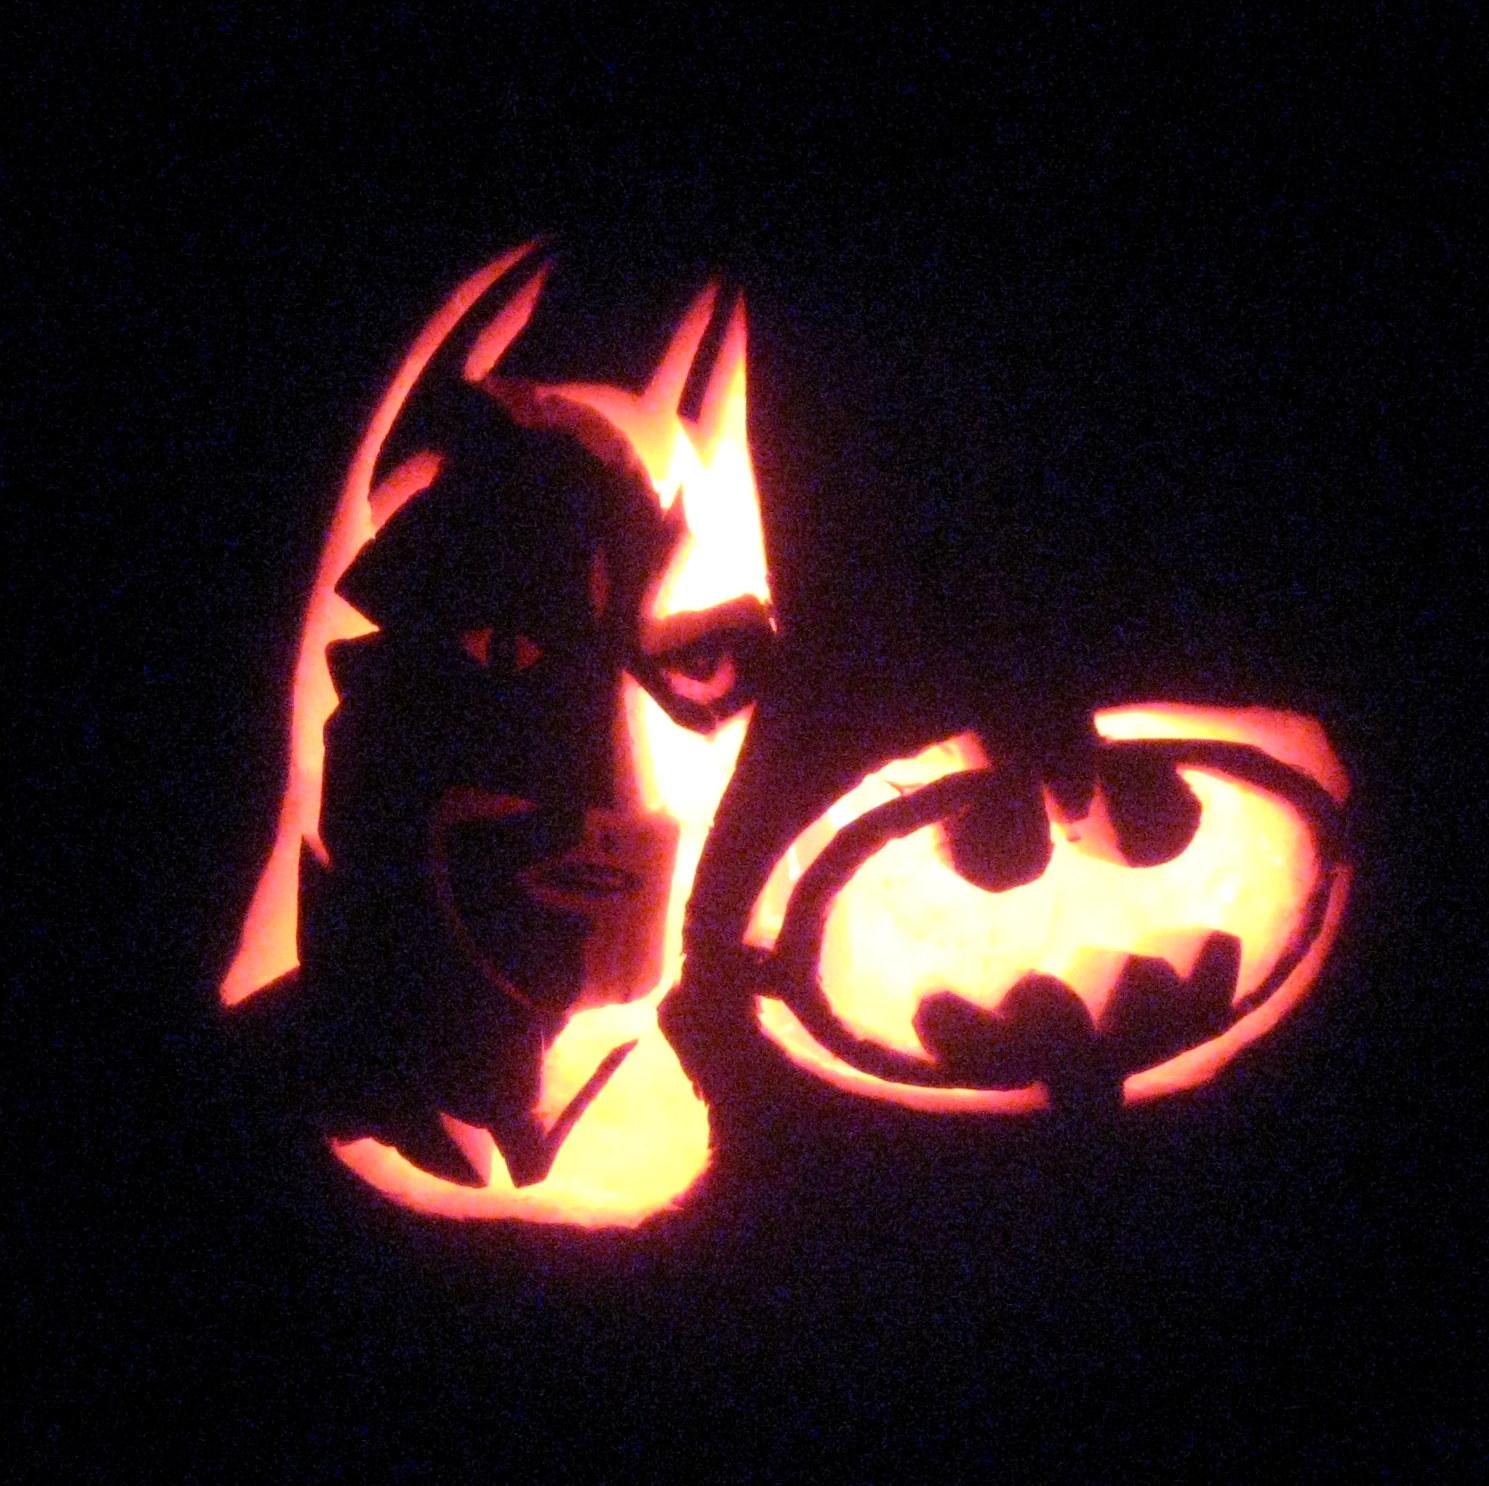 Cobo batman jack o lantern pumpkin